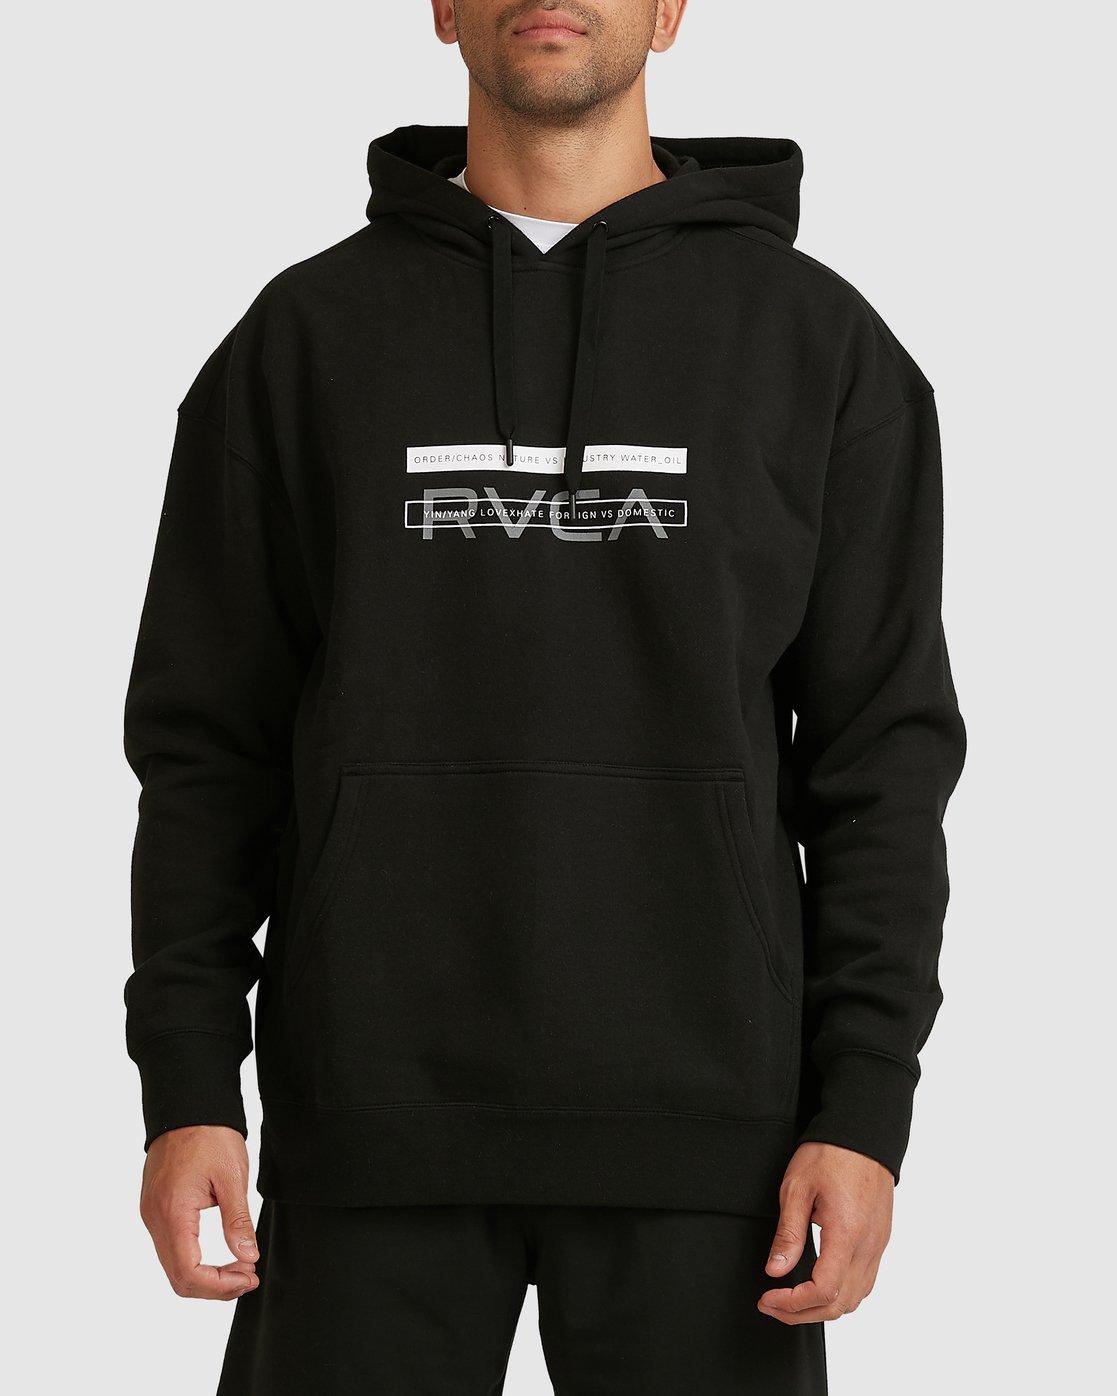 0 VA BAR HOODIE Black R317161 RVCA